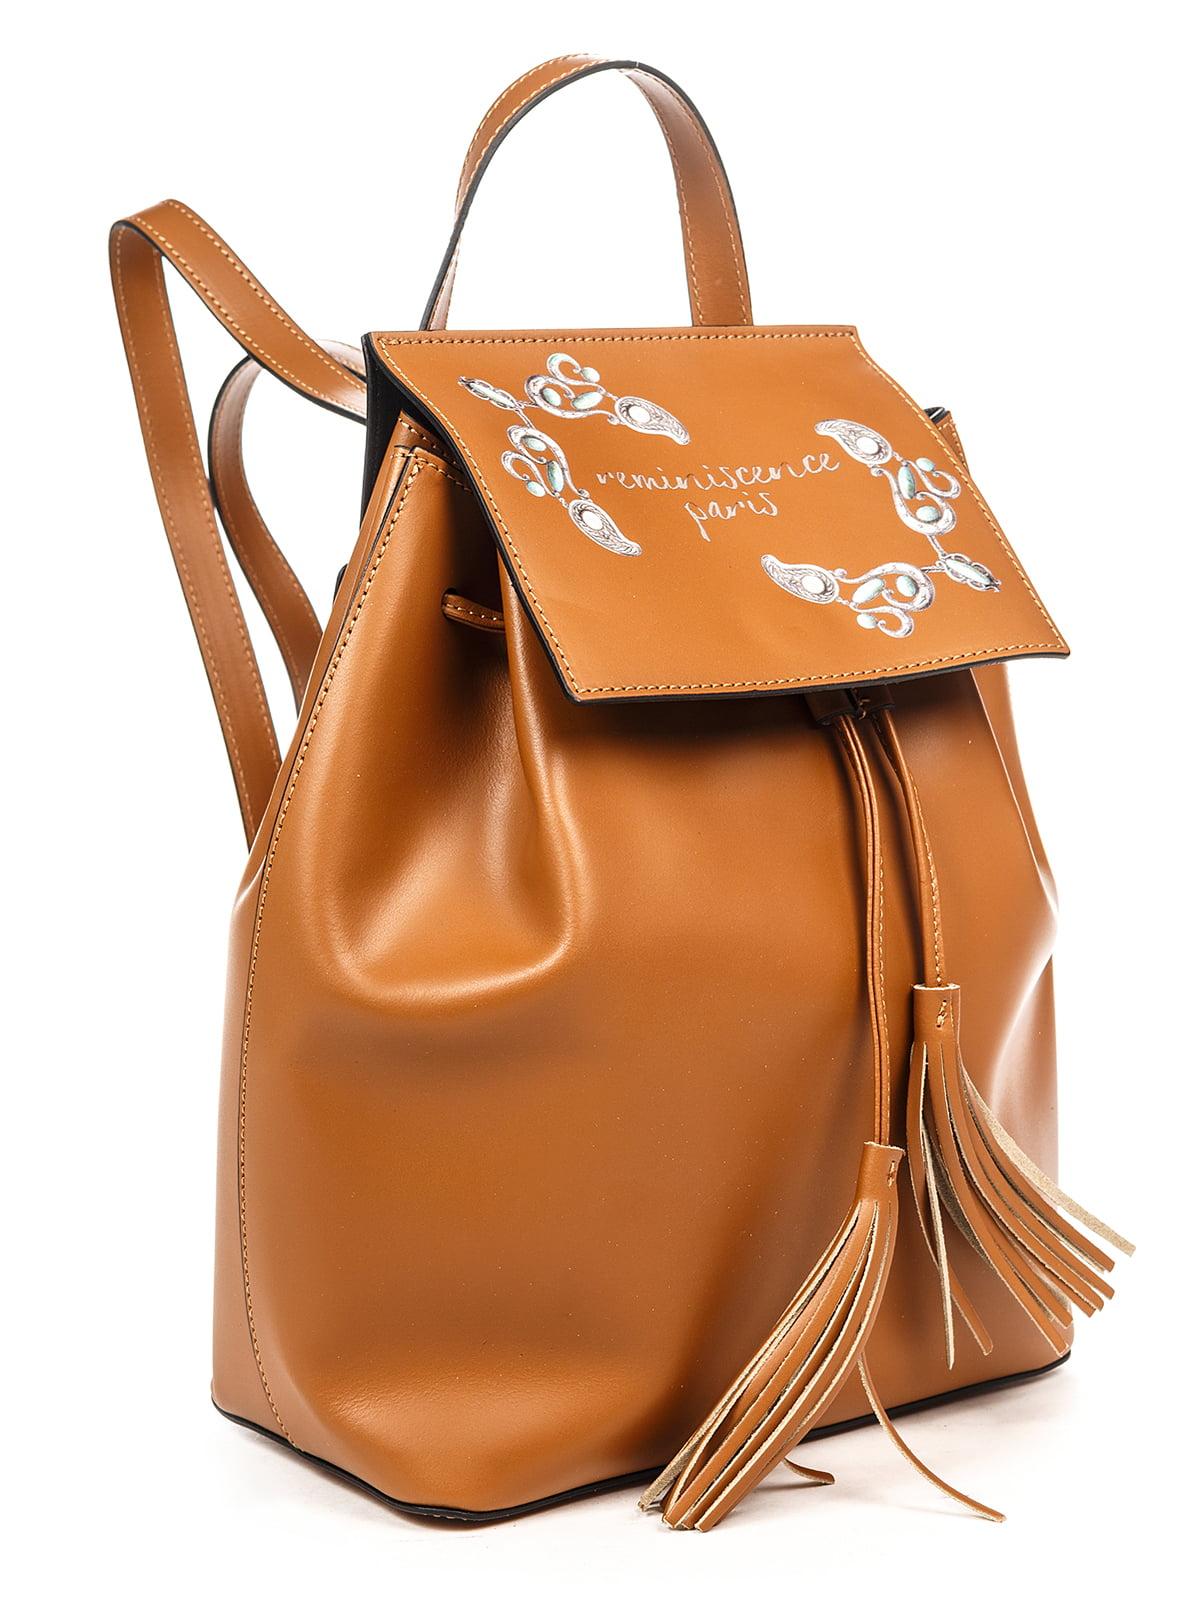 Рюкзак коньячного кольору | 4979545 | фото 3